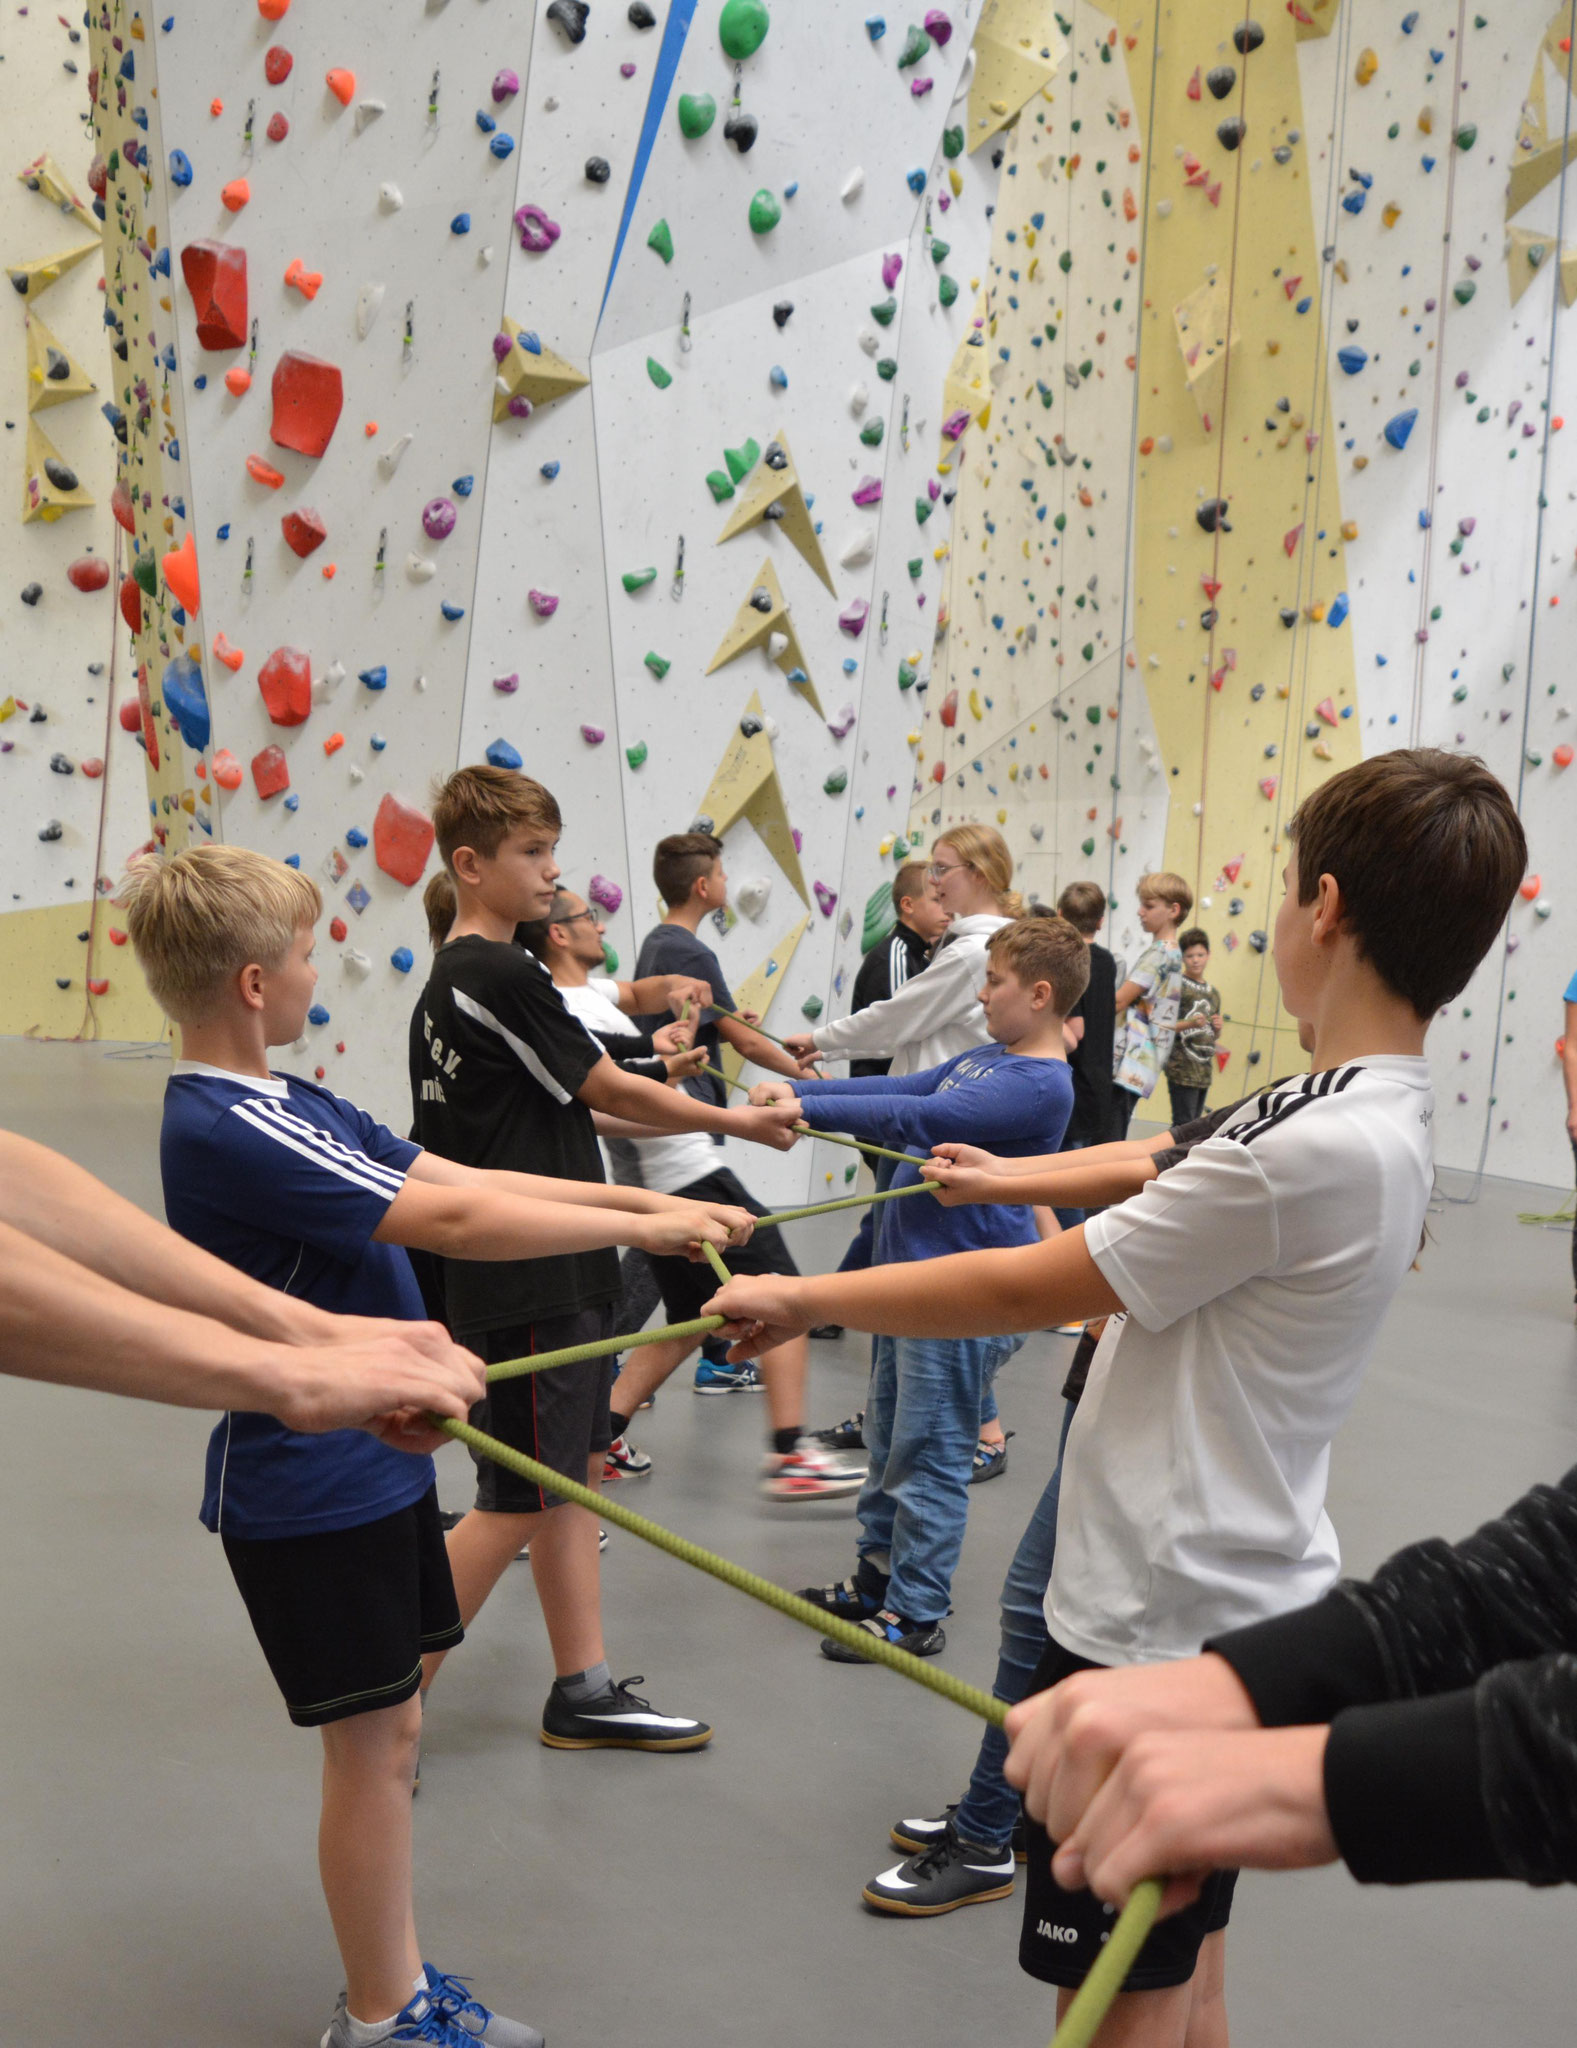 Teamspiele 2T Kletter- und  Boulderhalle Lindlar